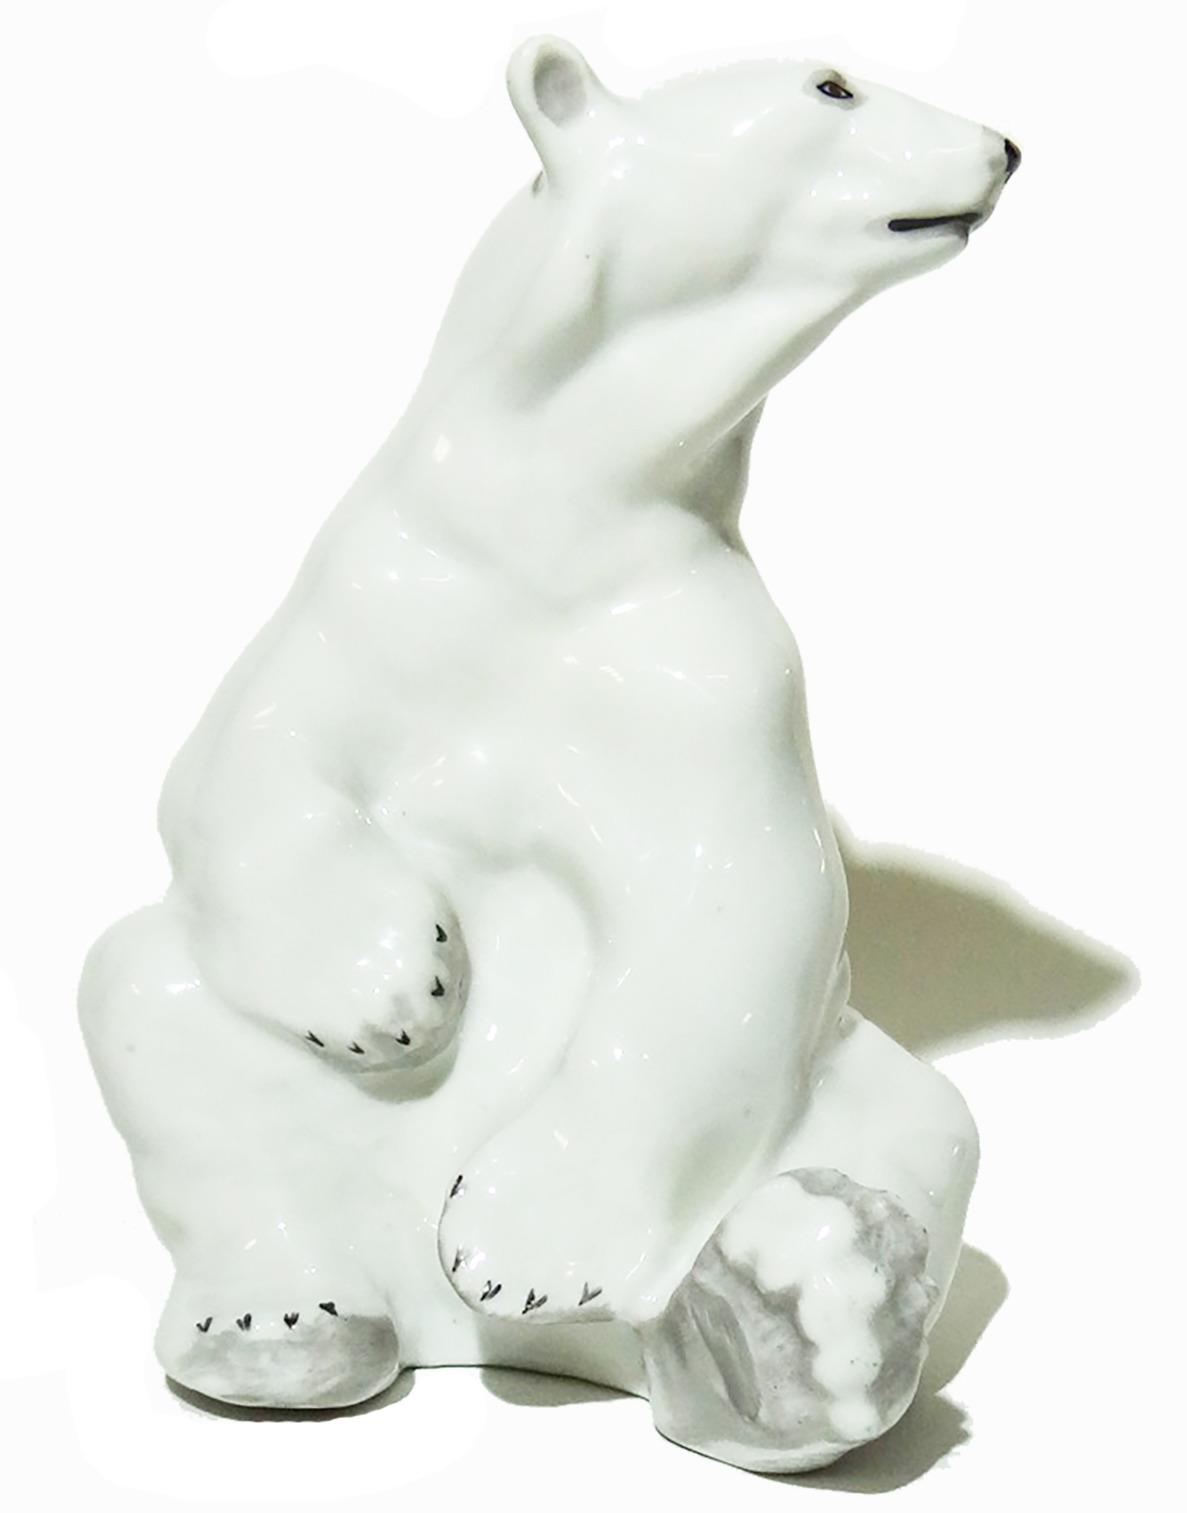 Статуэтка Белый медведь. Фарфор, роспись. СССР, ГиКИ, 1950-60 гг хрустальная статуэтка медведь cristallerie royale de champagne